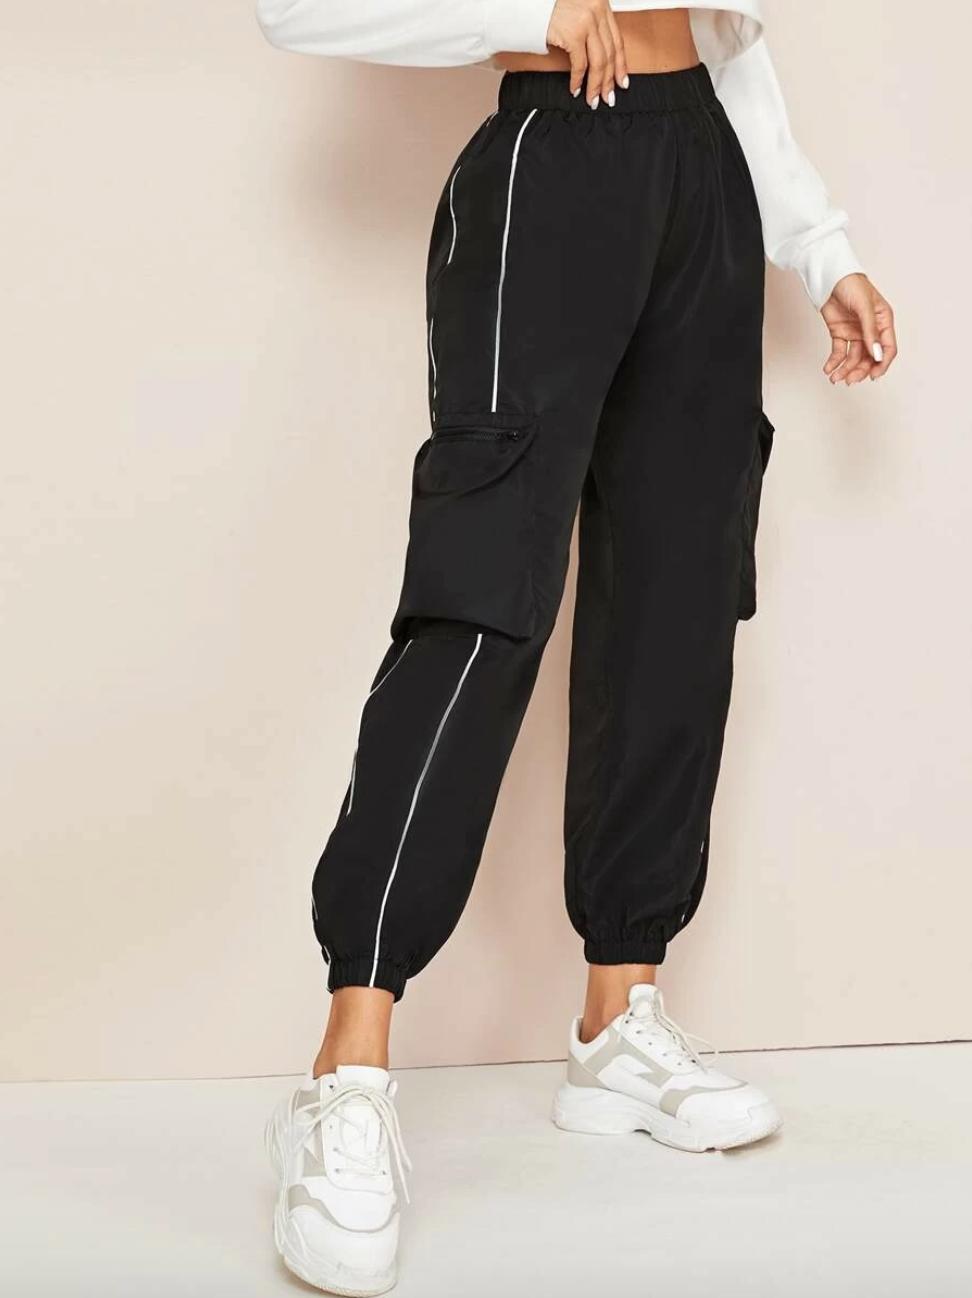 Woman S Fashion Inspo Tumblr Fashionn Enthusiast Pantalones De Moda Moda De Ropa Ropa Juvenil De Moda